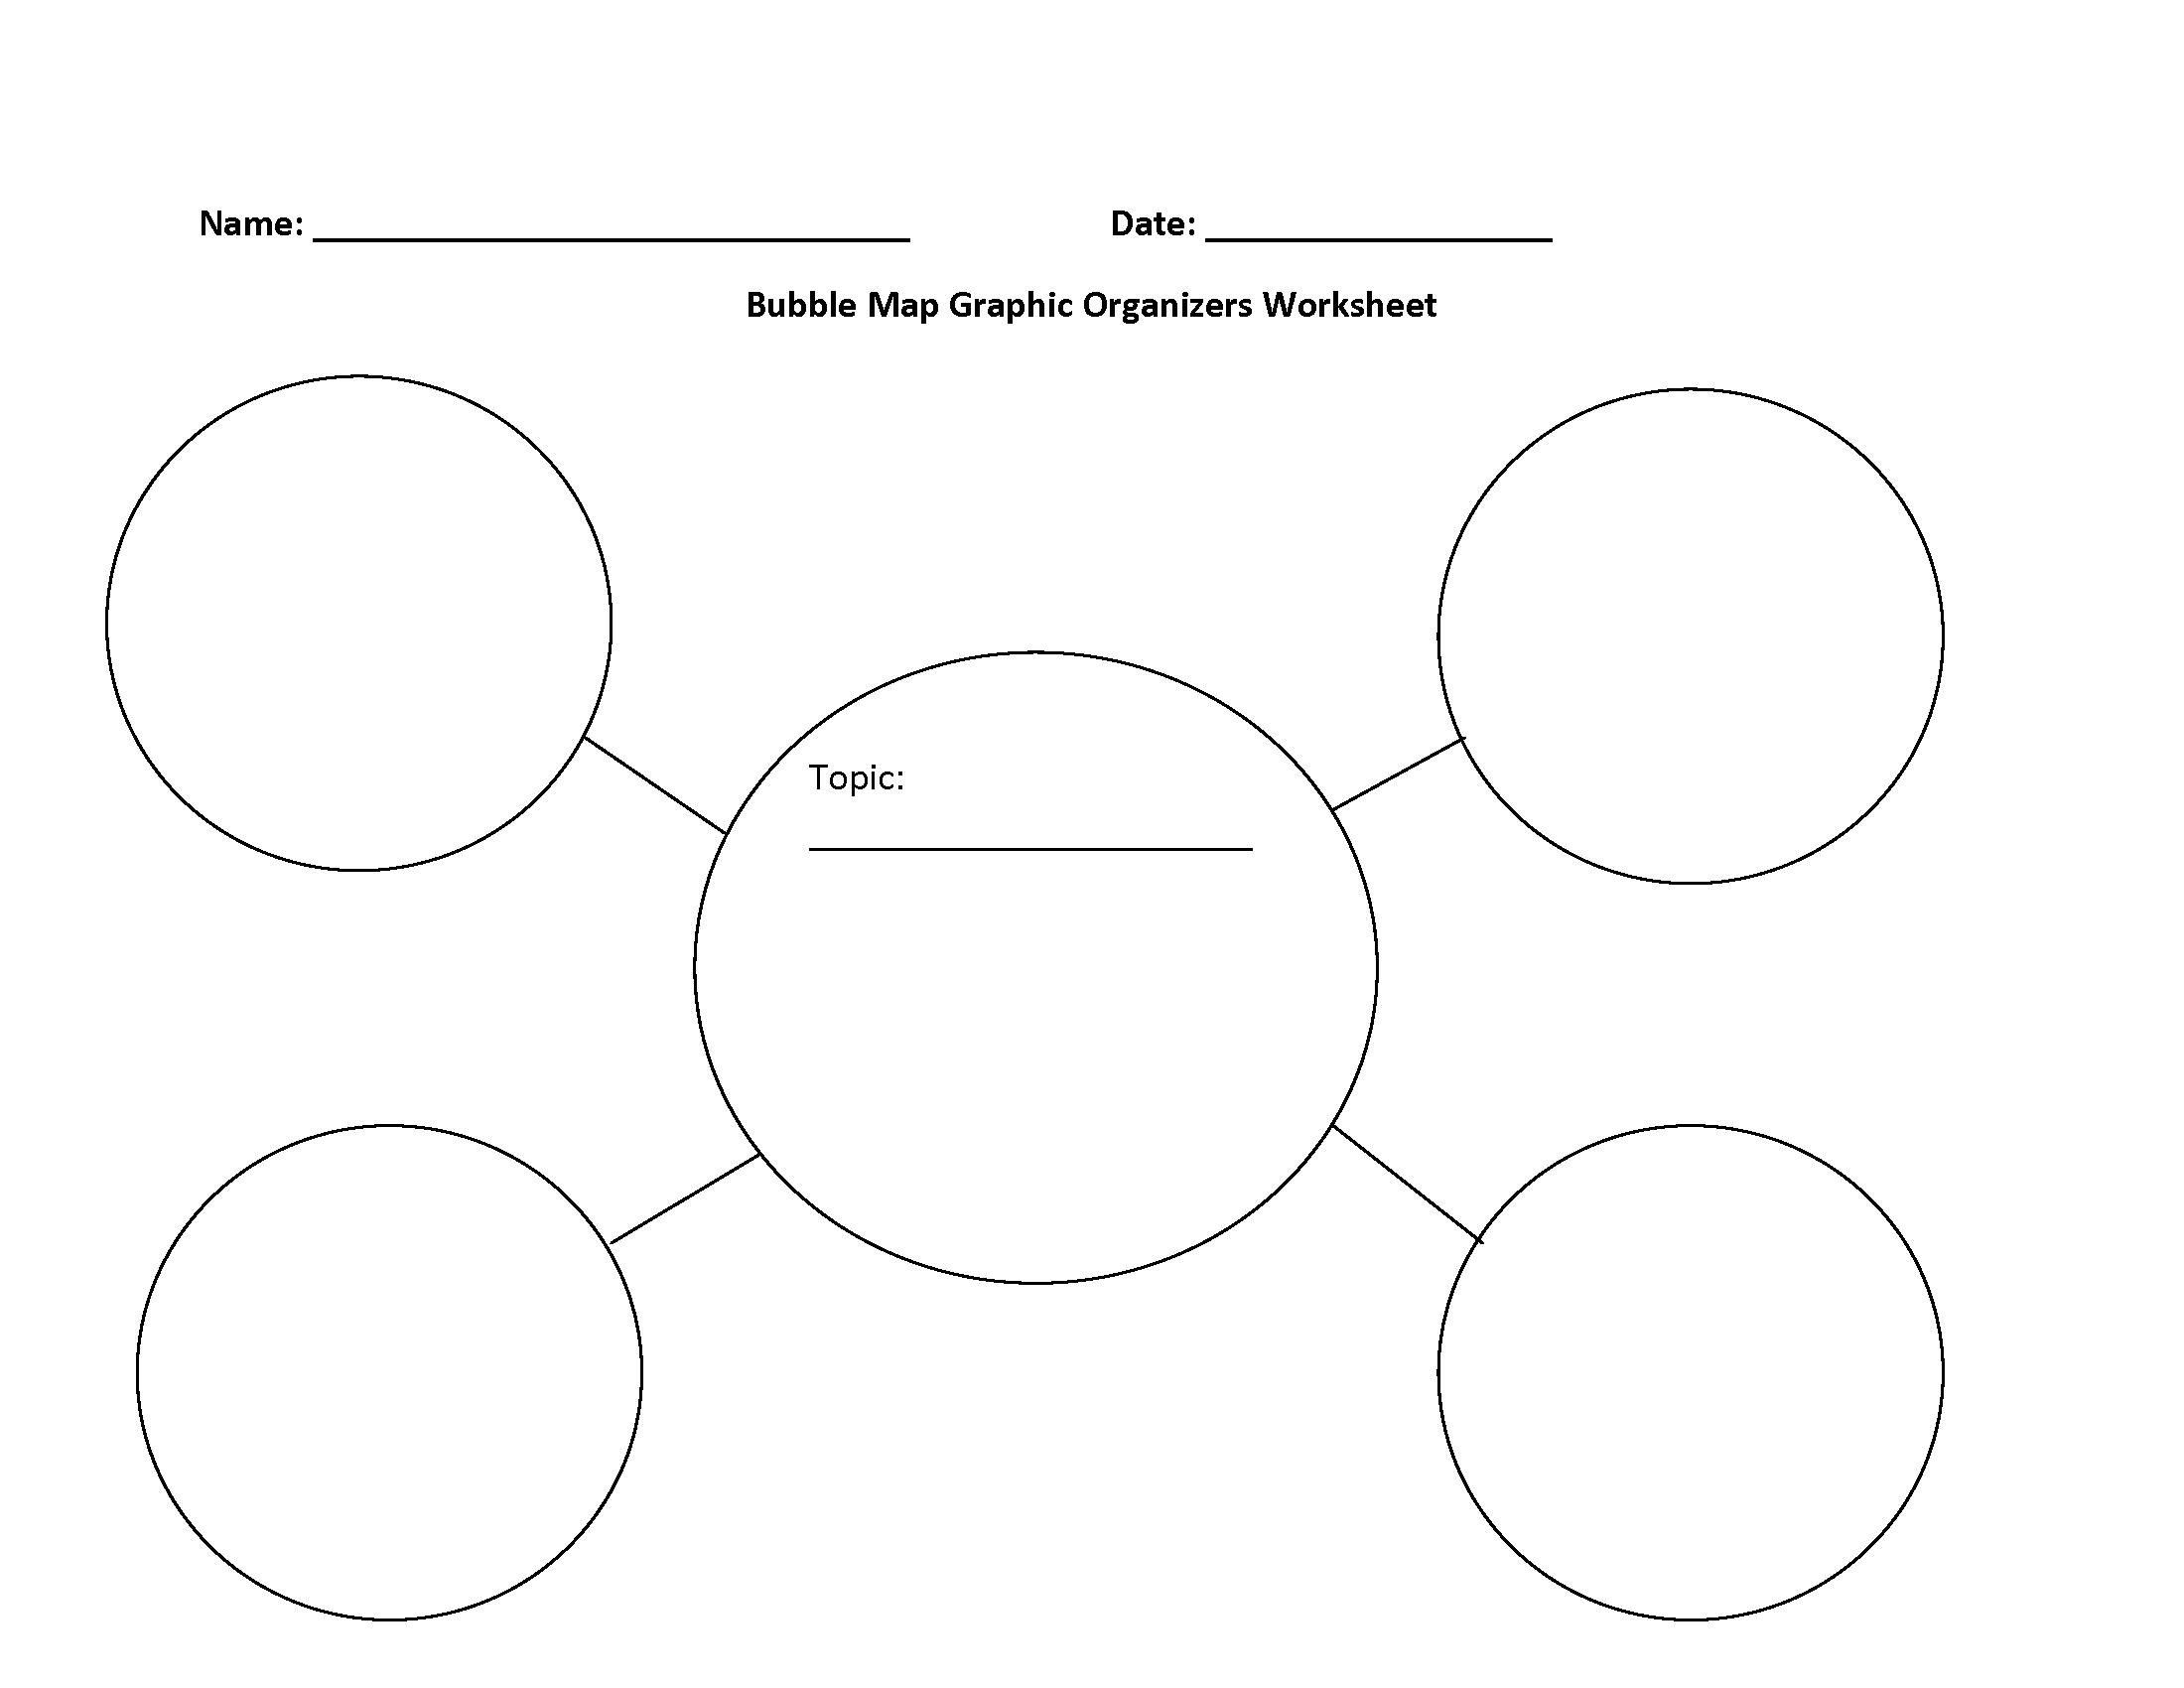 Englishlinx | Graphic Organizers Worksheets - Free Printable Graphic Organizers